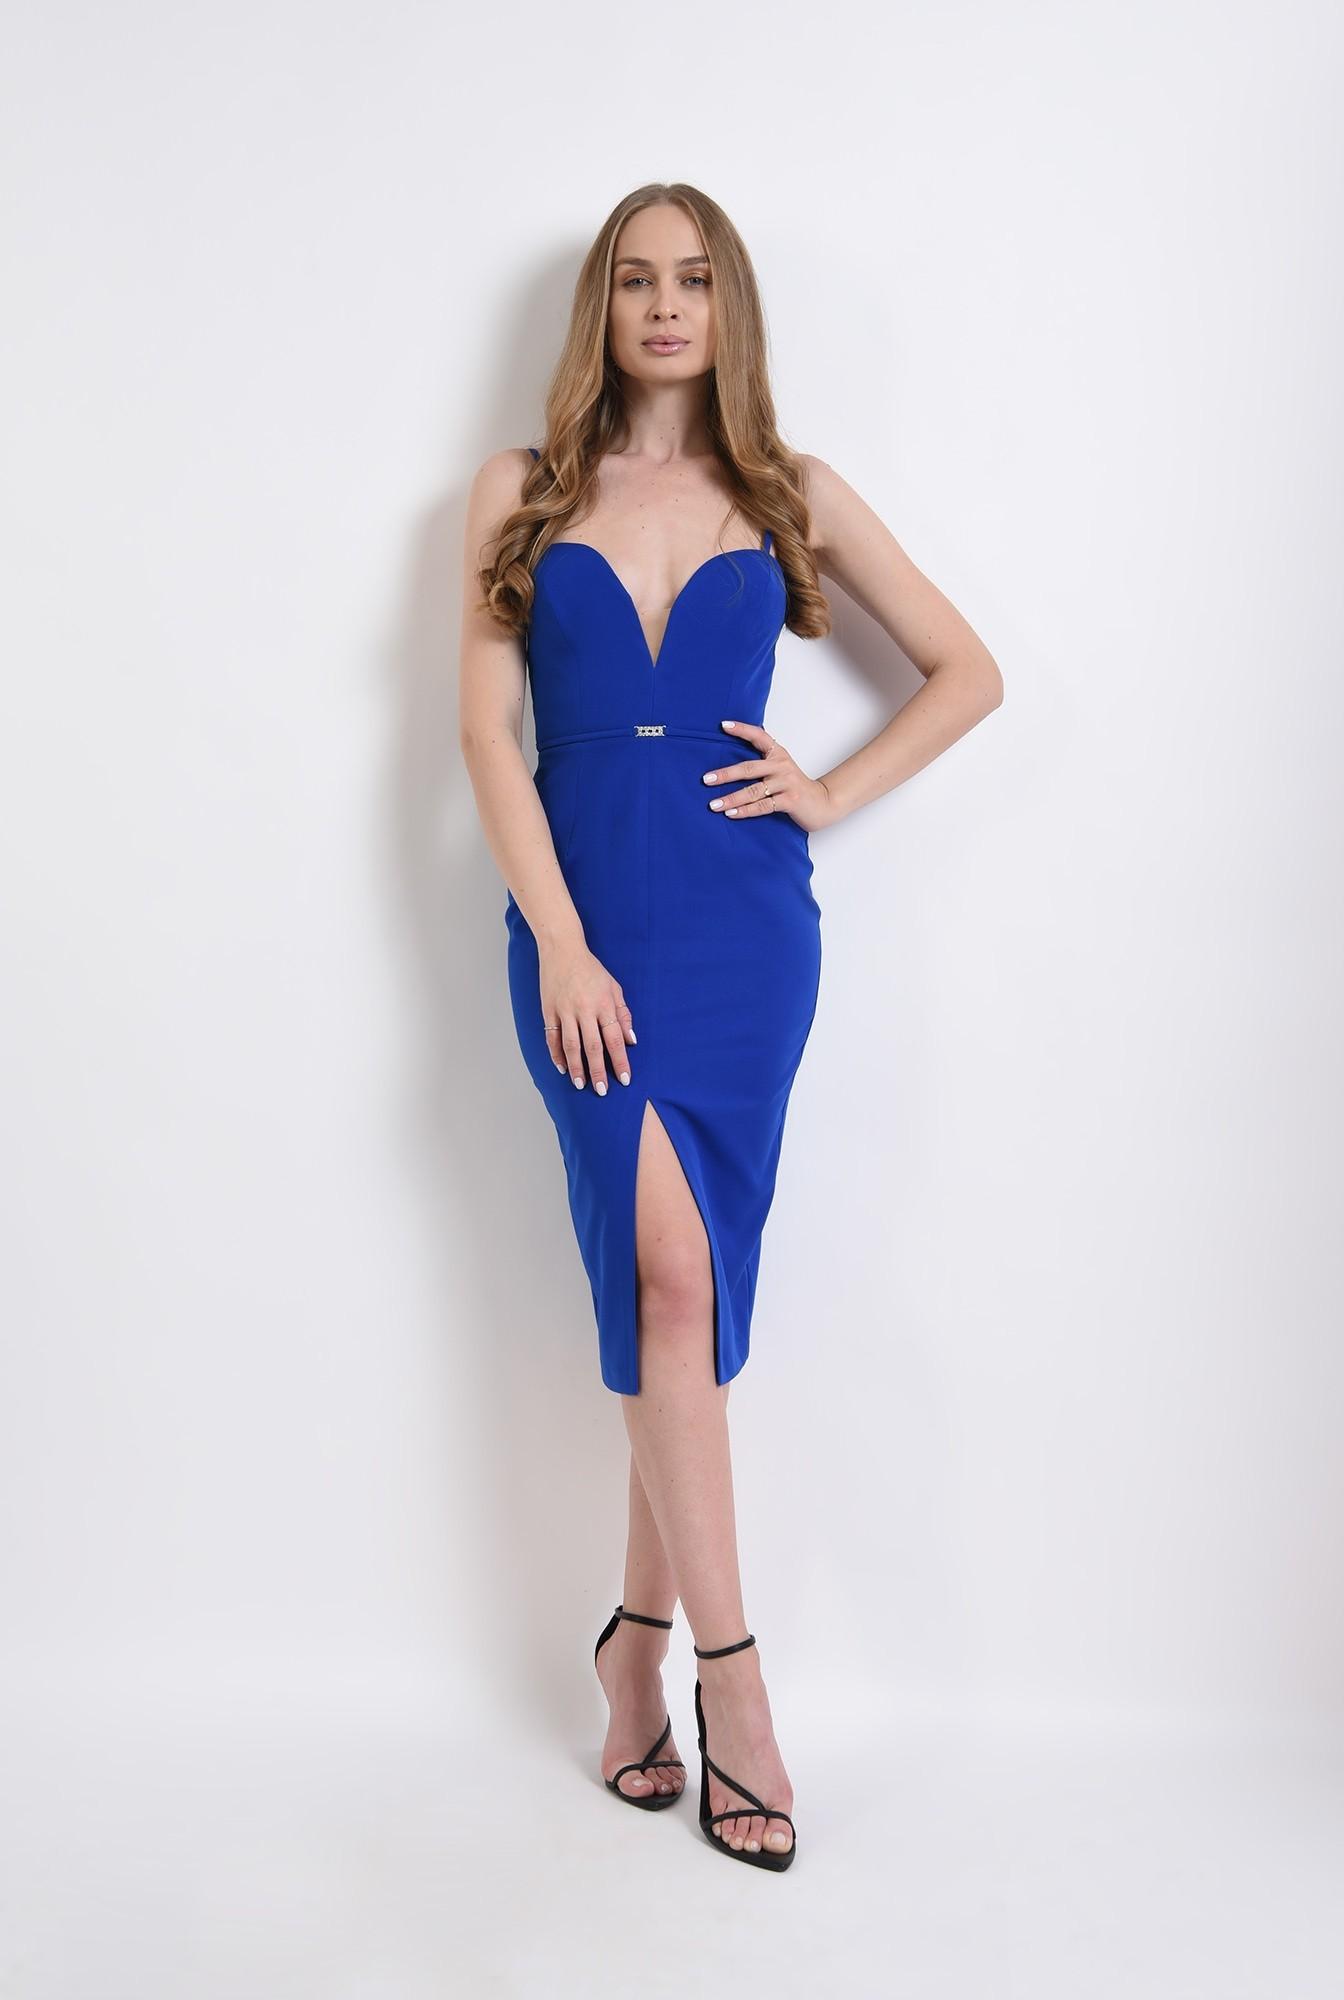 0 - rochie albastra, eleganta, cu decolteu